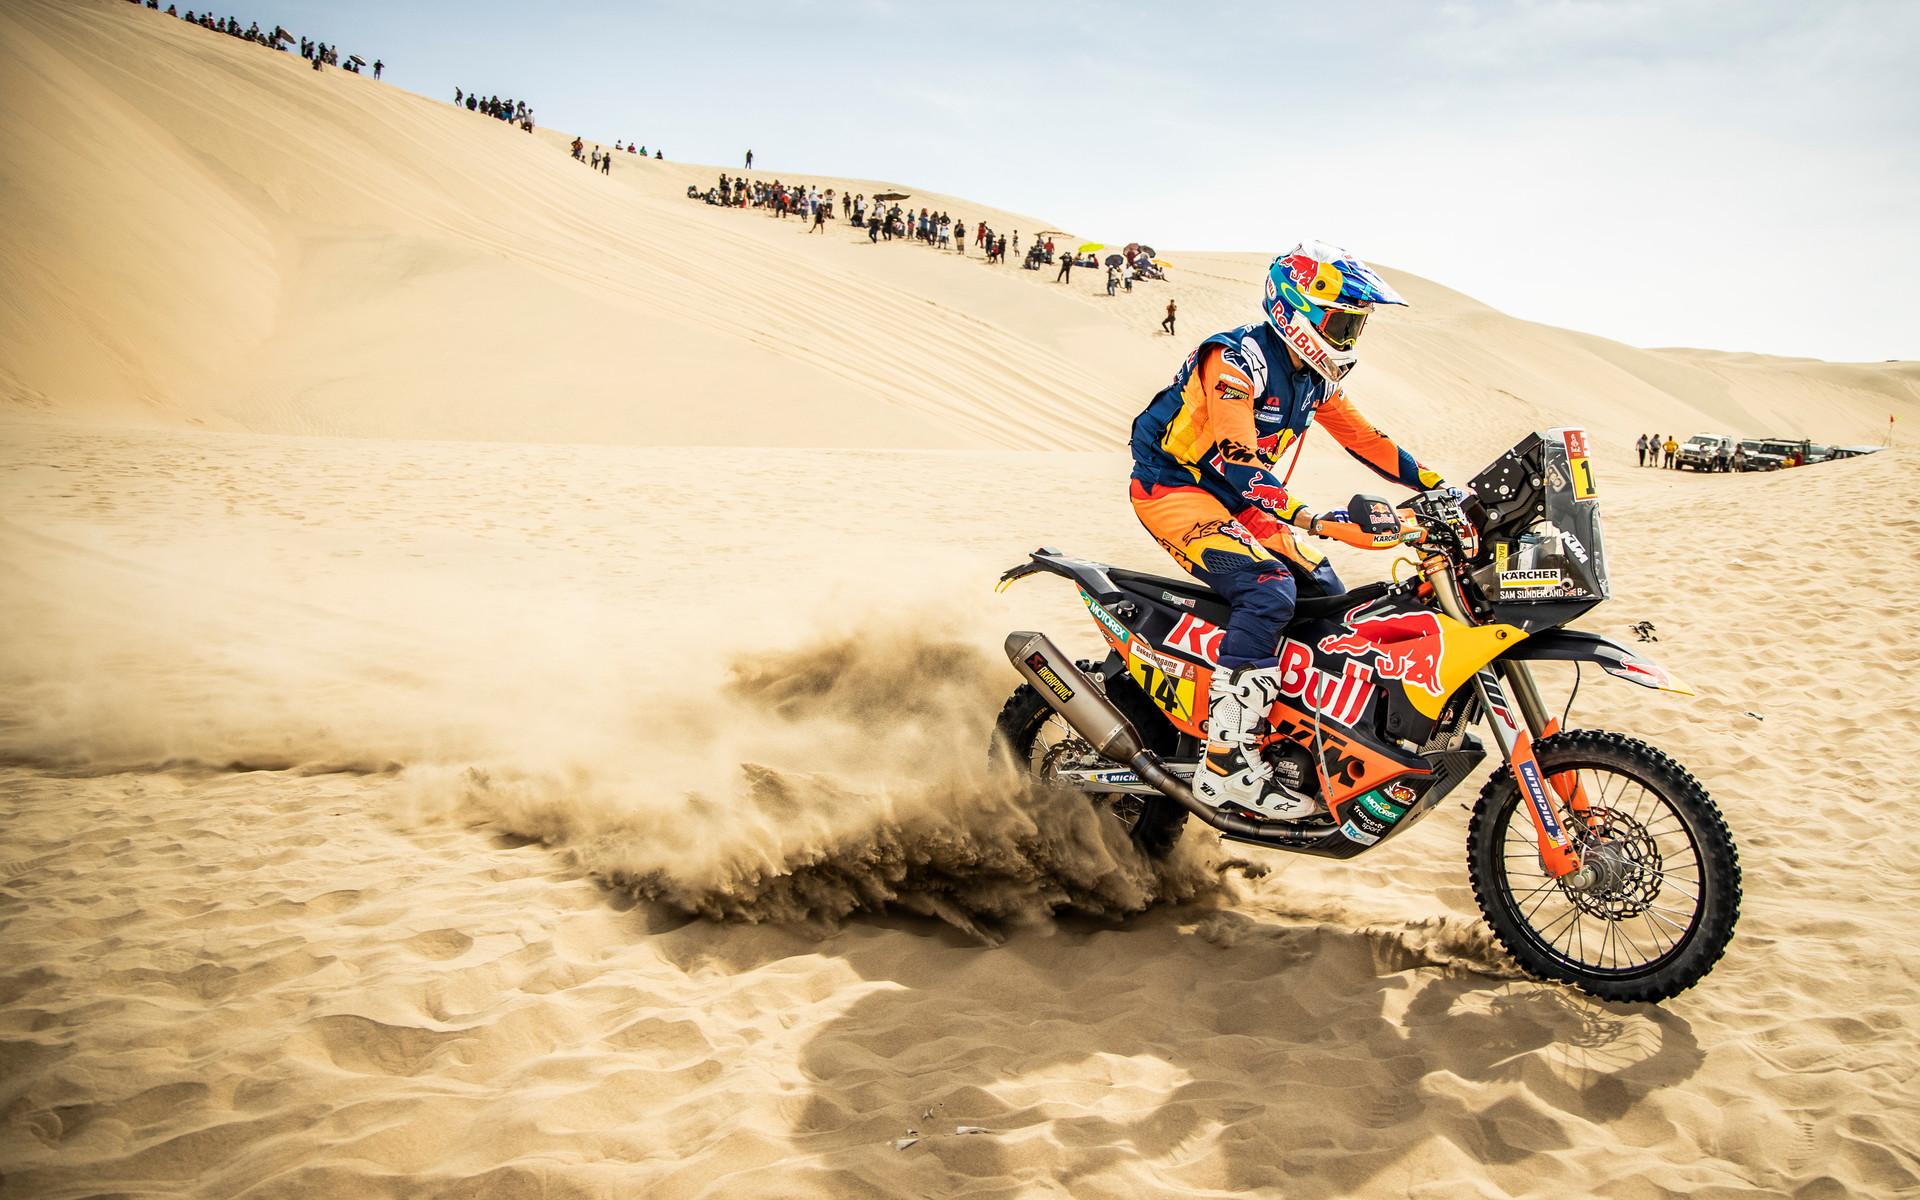 262230_sam-sunderland_stage2_Red-Bull-KTM-Factory-Racing_Dakar2019_122